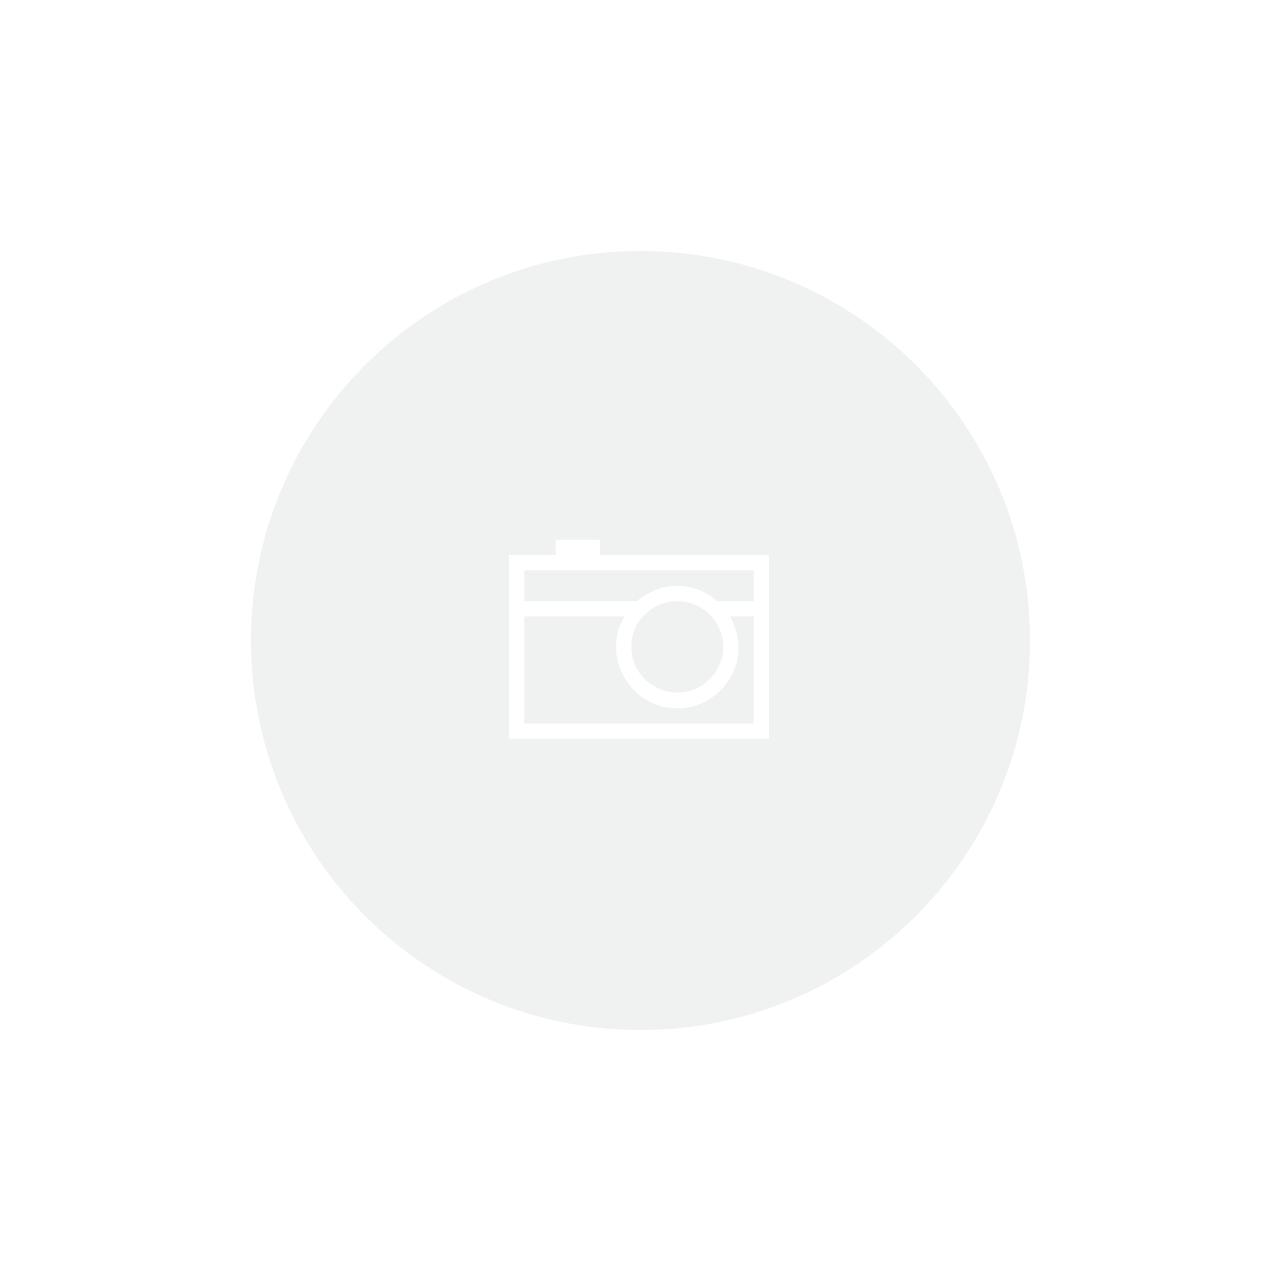 Placa de Vídeo Gigabyte Geforce RTX 2080 Windforce OC 8GB GV-N2080WF3OC-8GC GDDR6